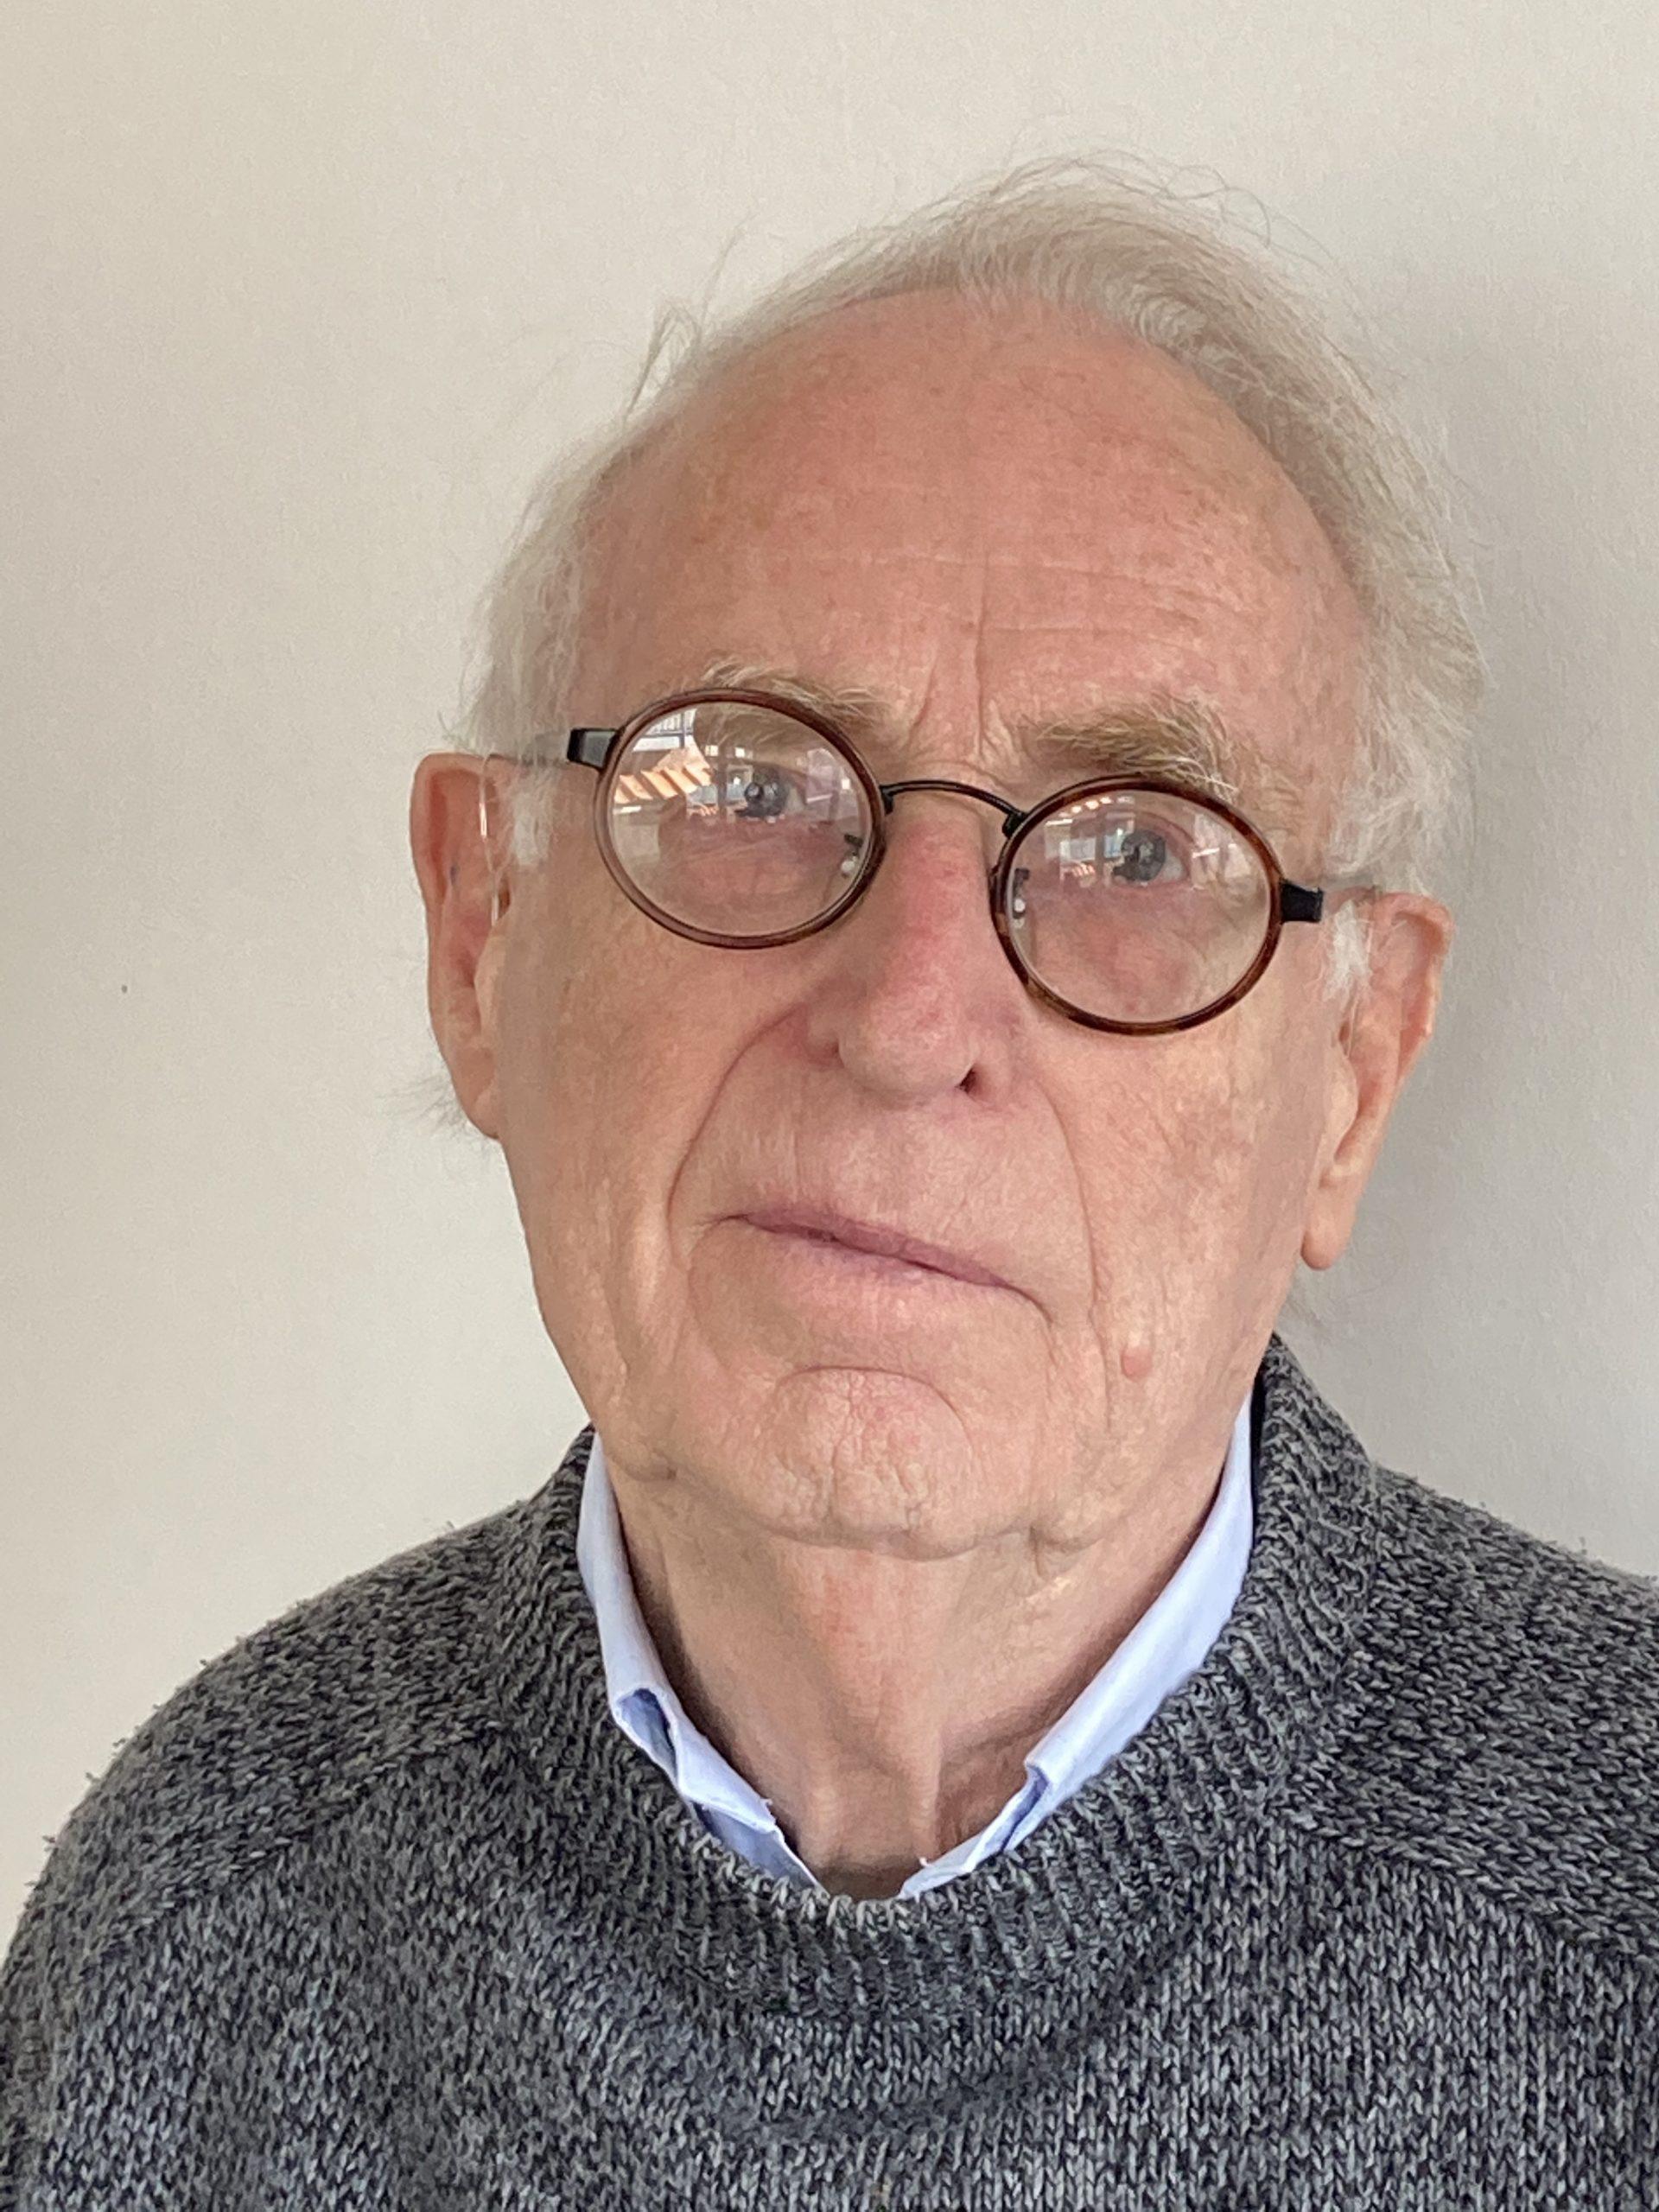 Kurt Sørensen